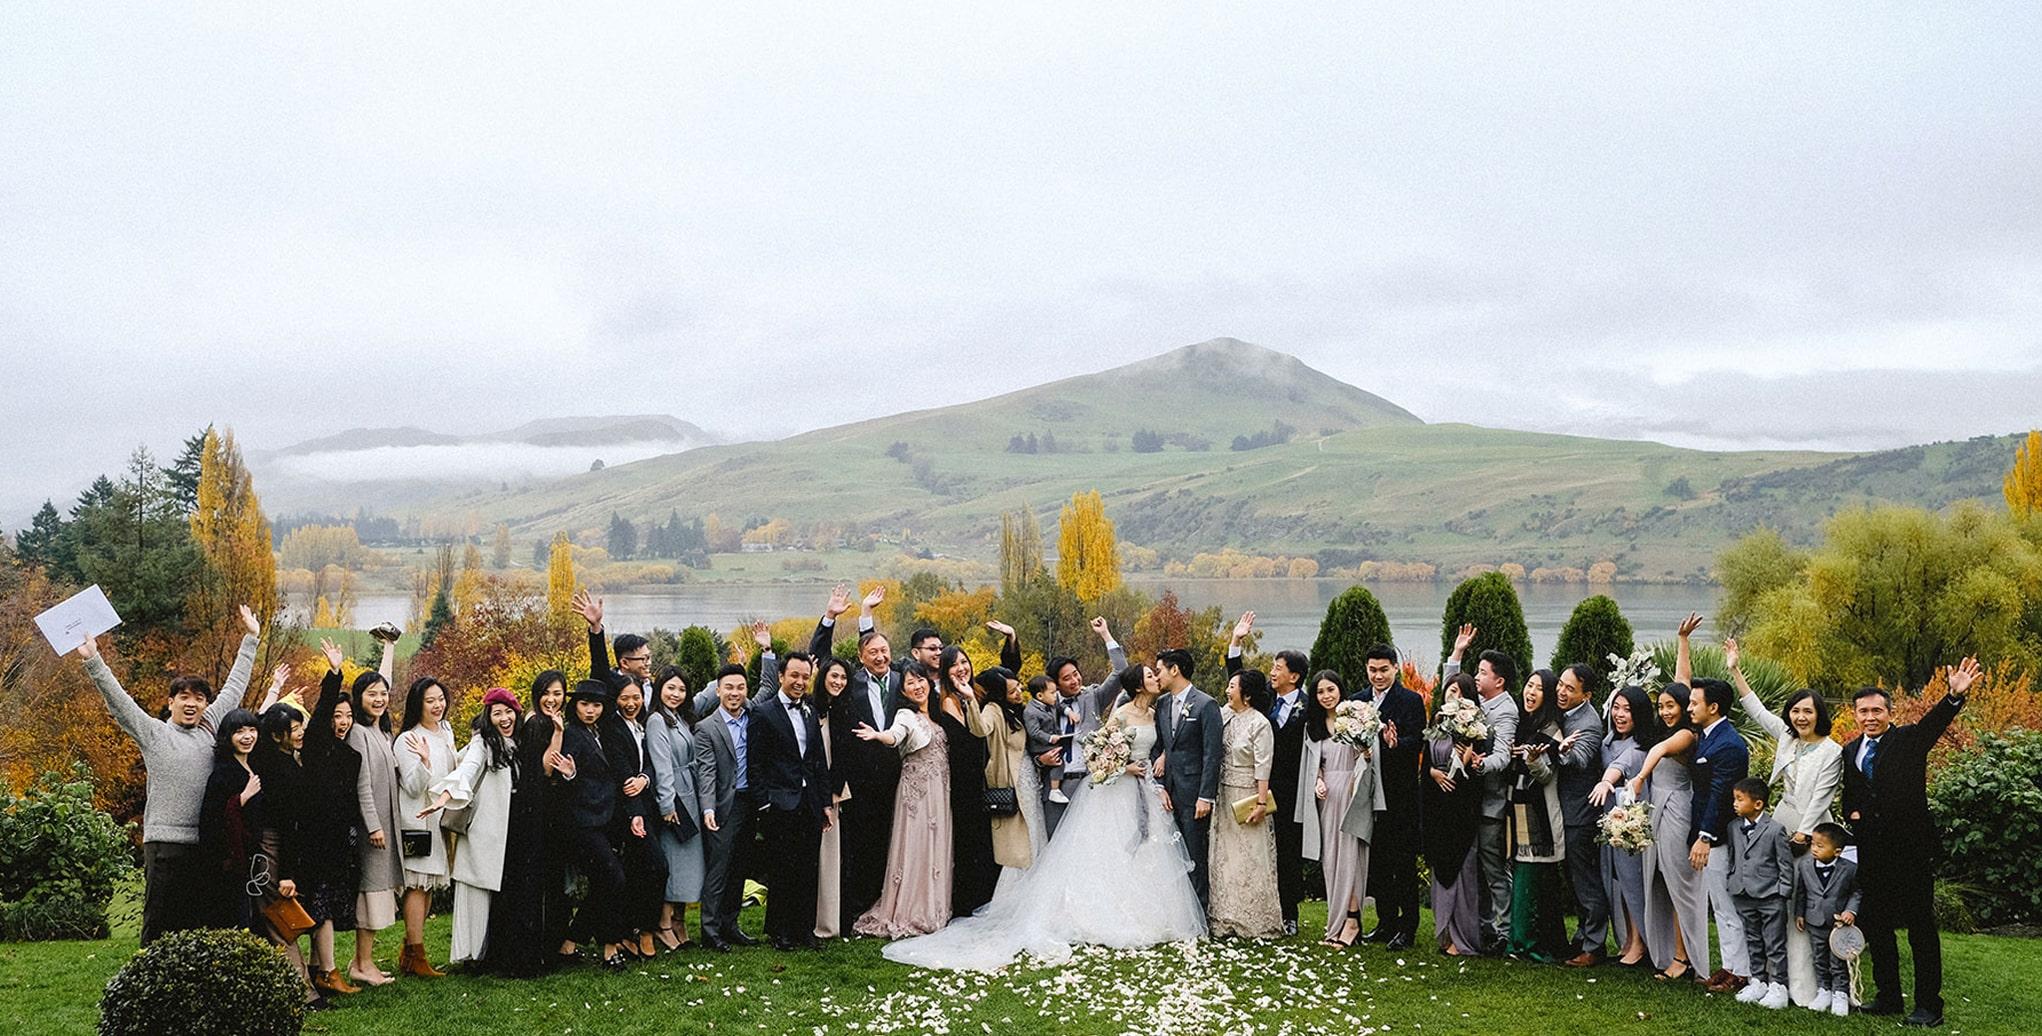 Axioo: Destination Wedding? Why not!